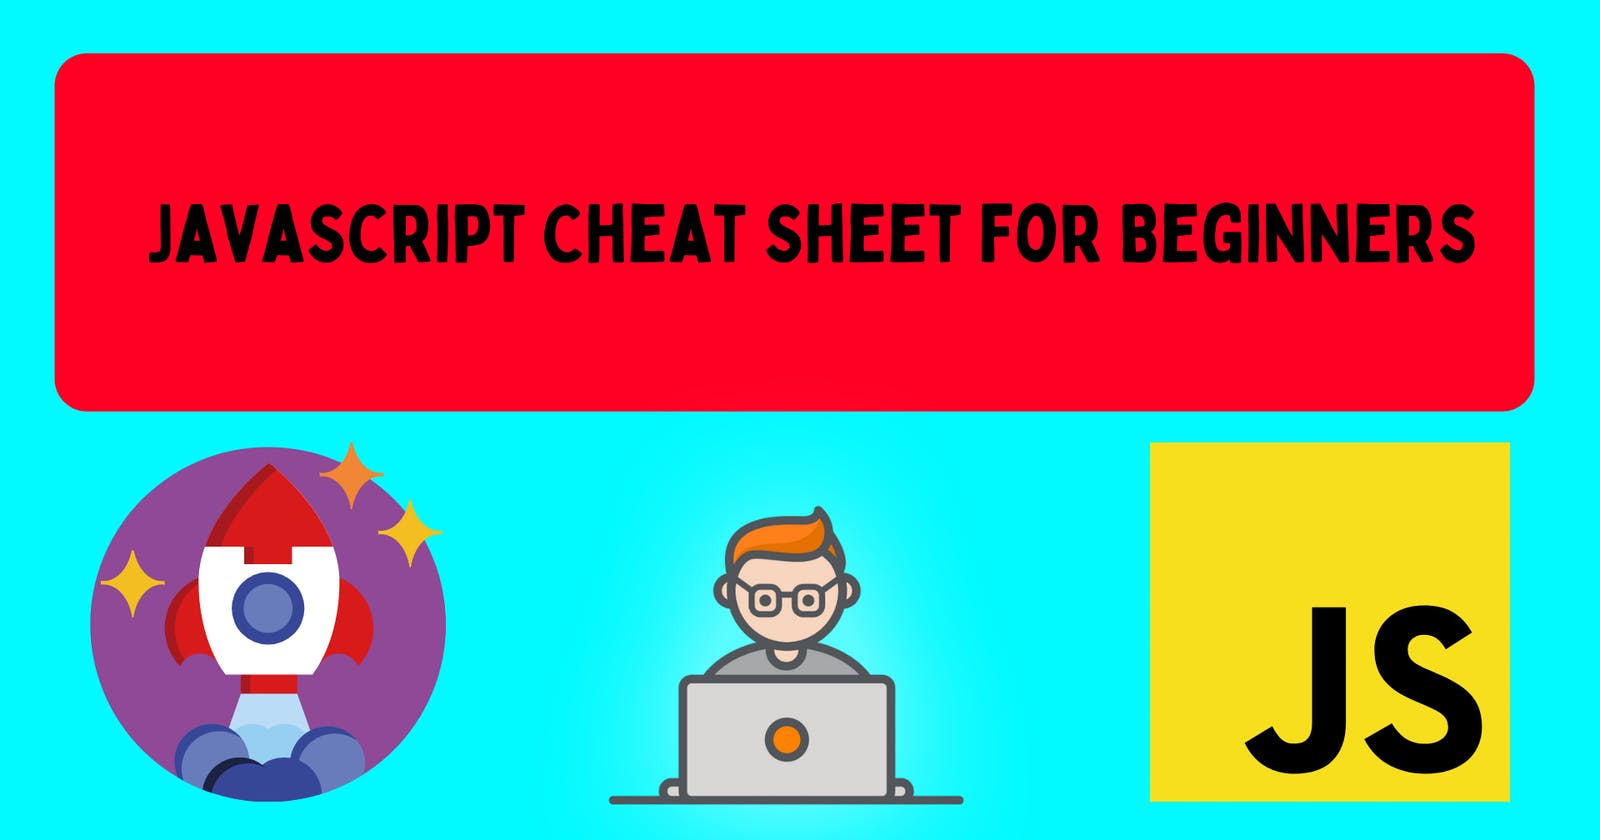 JavaScript Cheat Sheet for Beginners